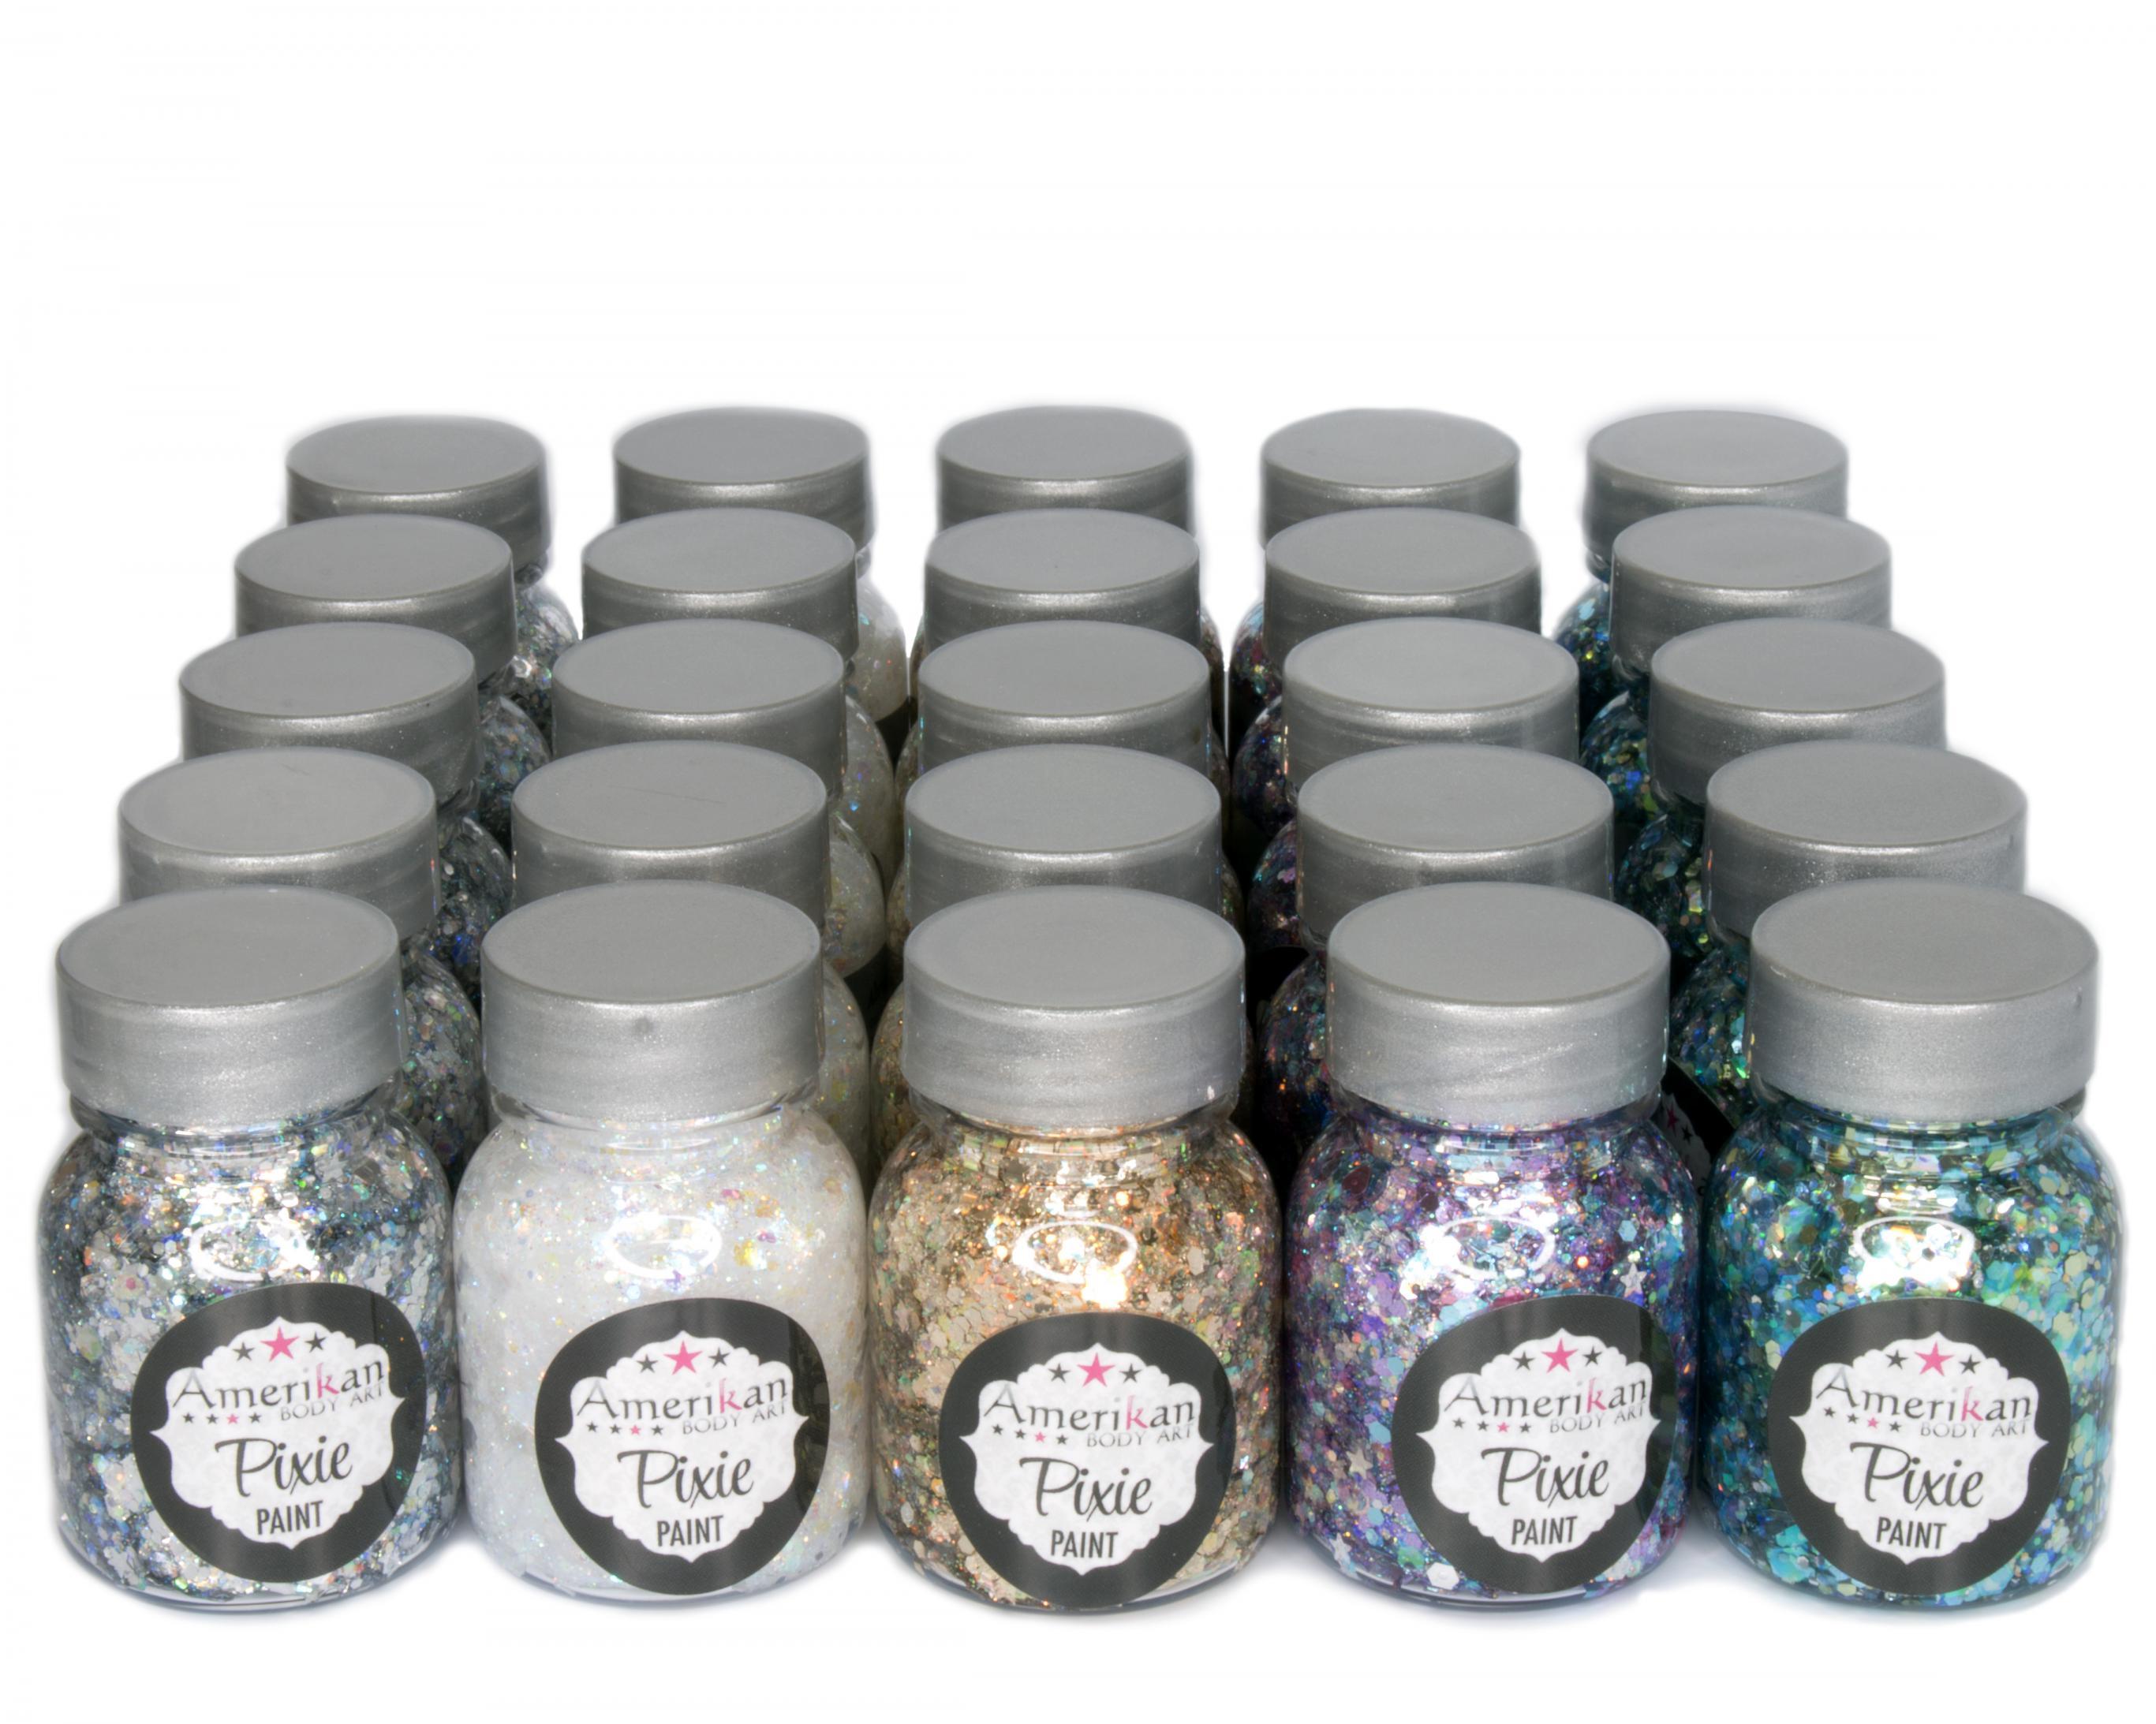 Pixie Paint Retailer Starter Pack (25-Pack)